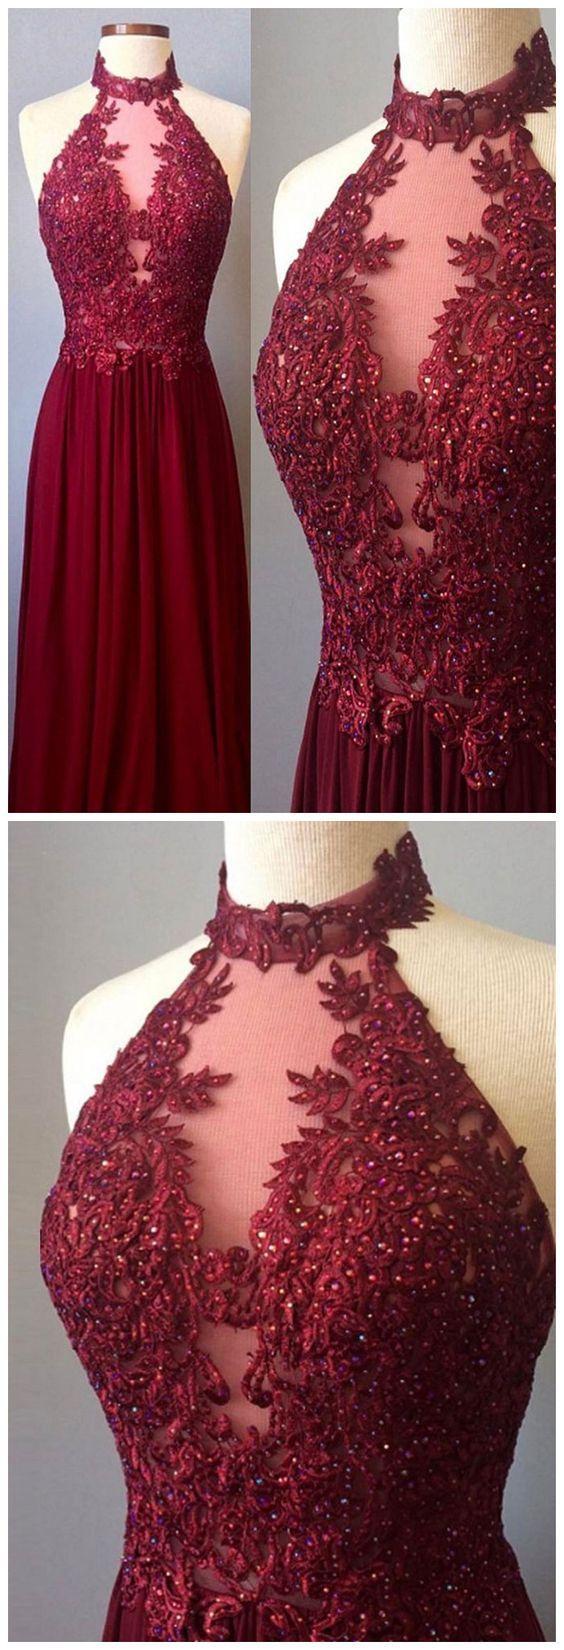 Prom Dress,Cute Dresses, Simple Chiffon Lace Prom Dresses,Long Prom Dresses,Evening Dresses